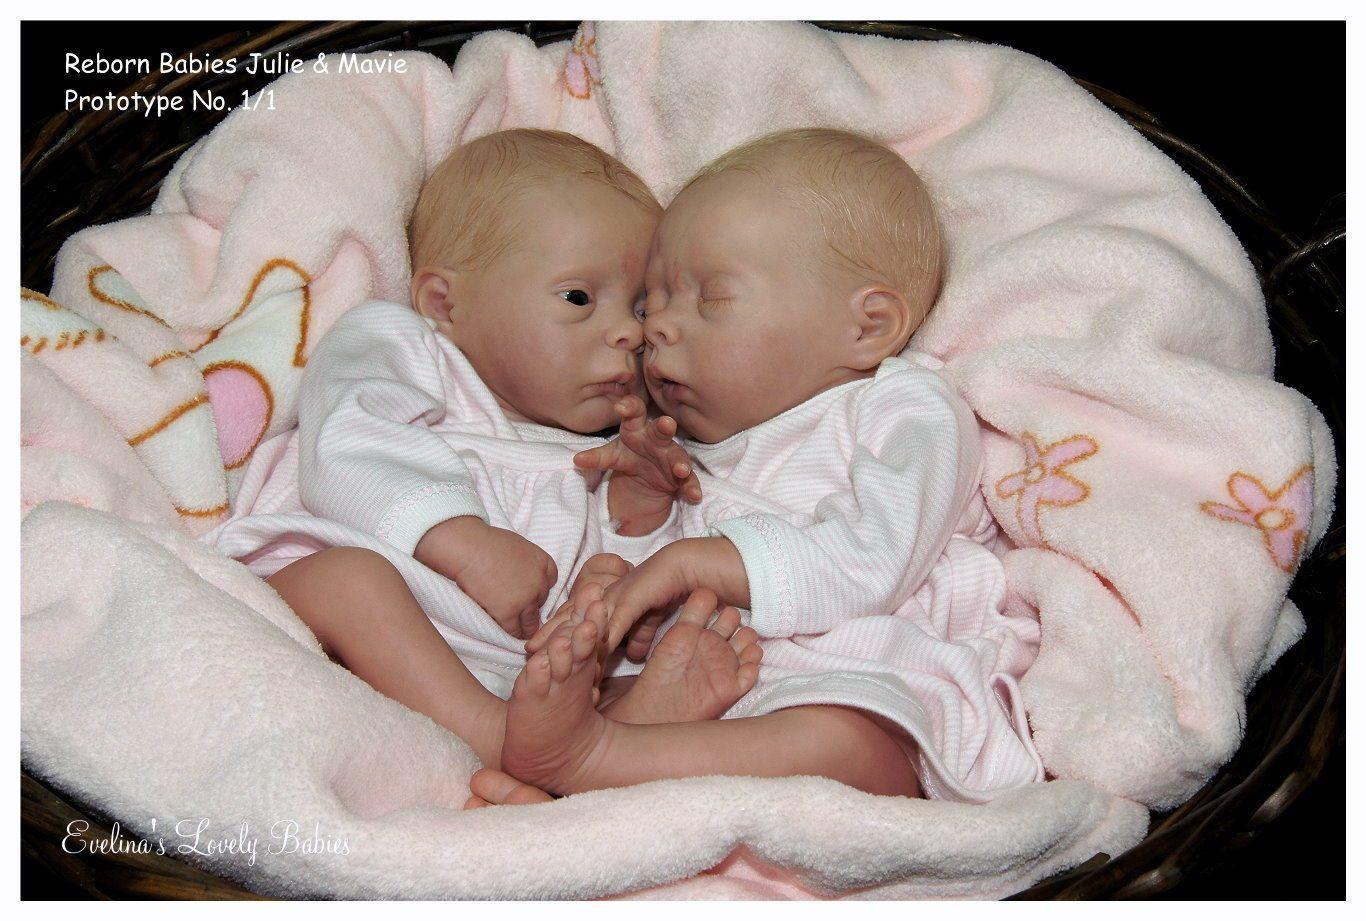 Reborn Doll Kit Twins Mavie Julie by Evelina Wosnjuk